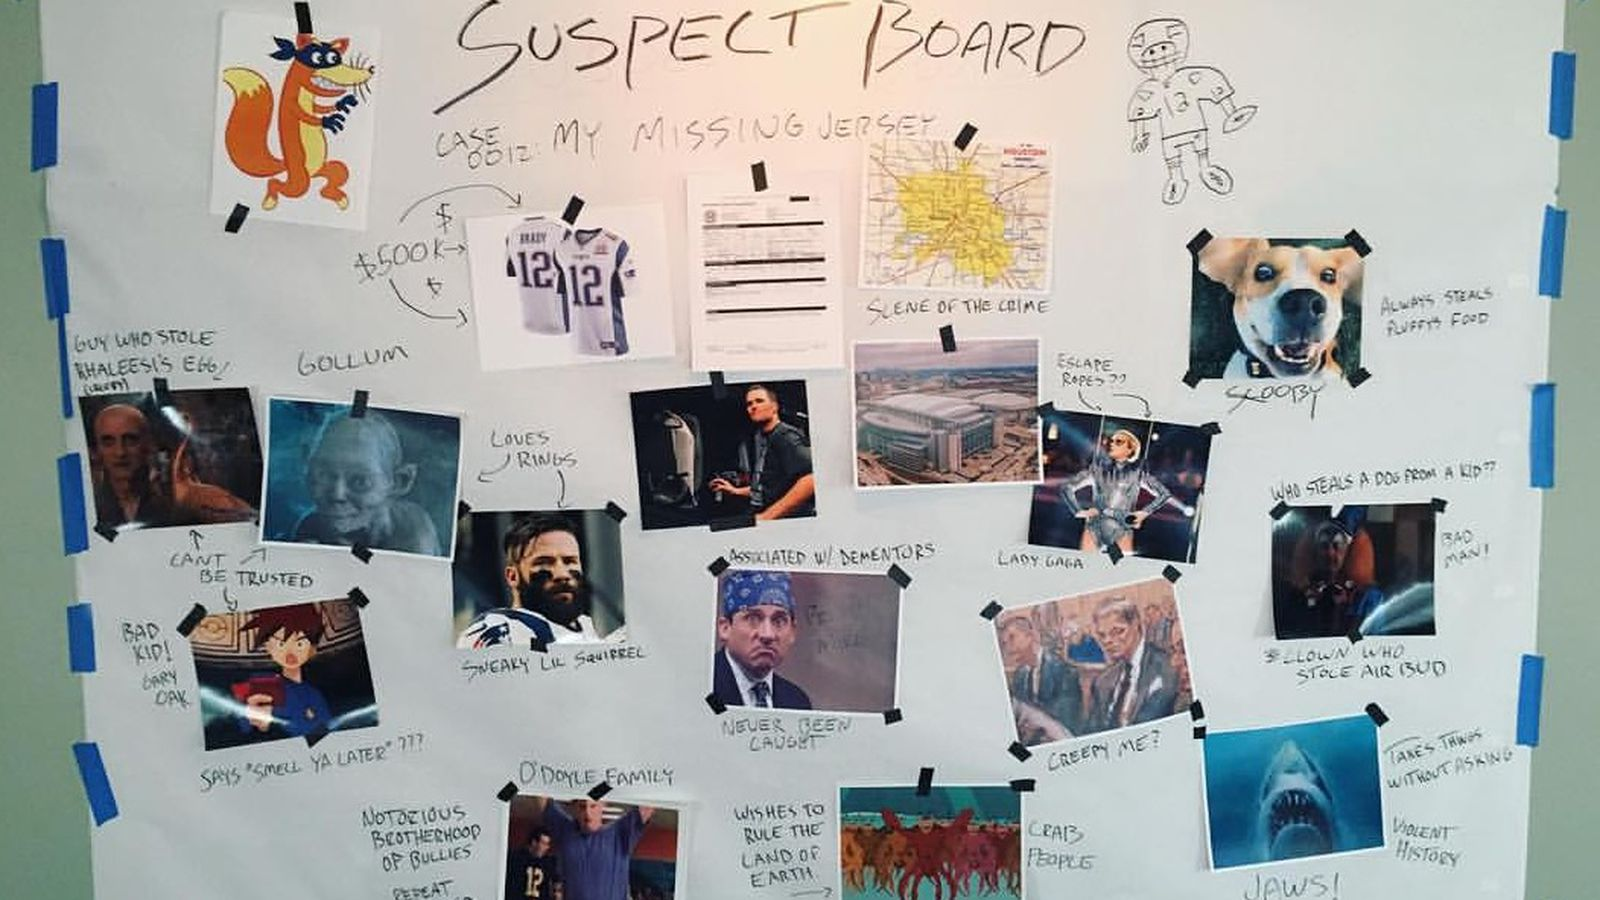 Suspectboard.0